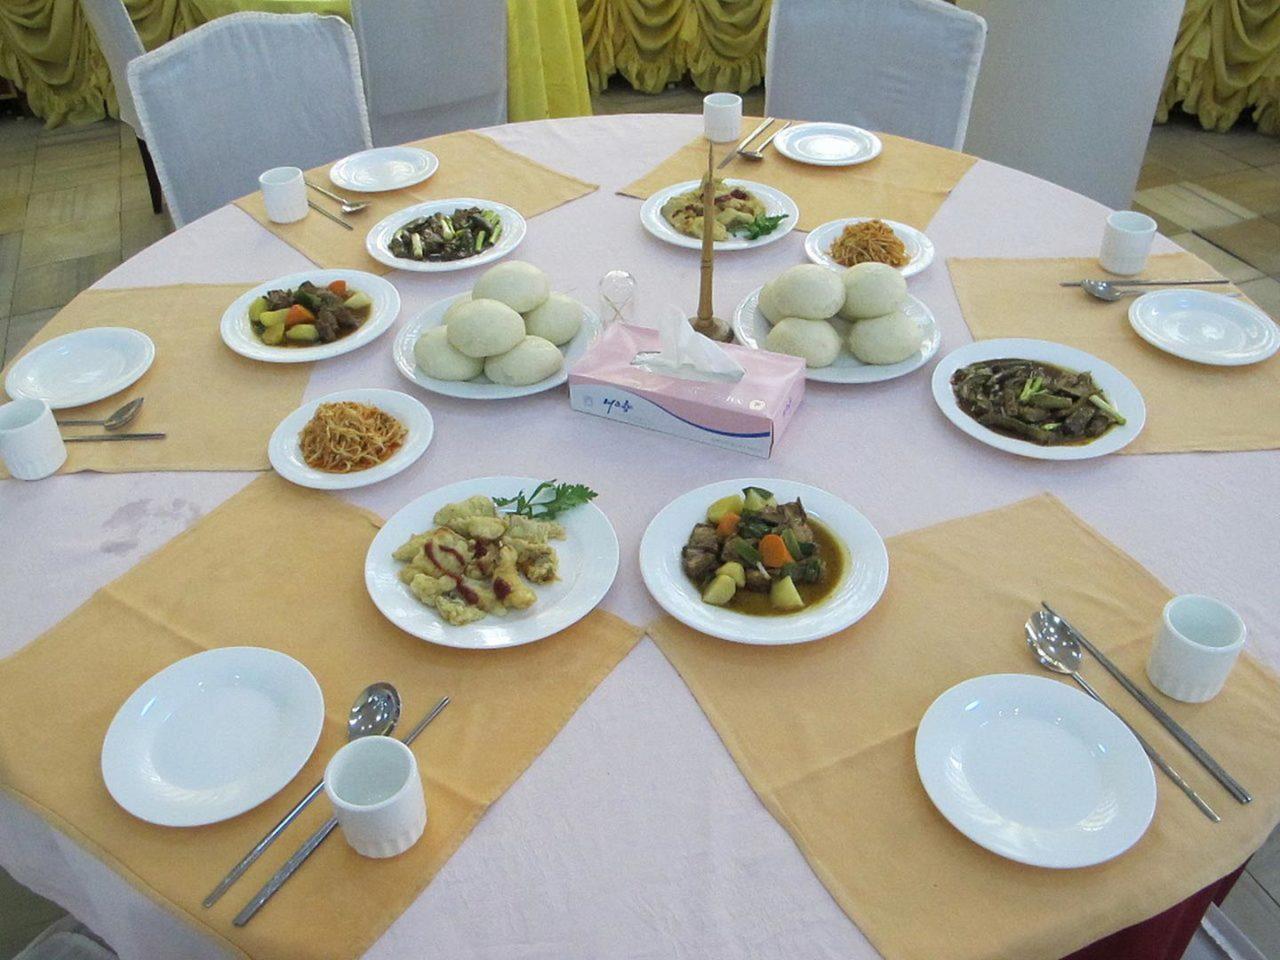 https://thesubmarine.it/wp-content/uploads/2017/09/1280px-Cuisine_of_North_Korea_06-1280x960.jpg